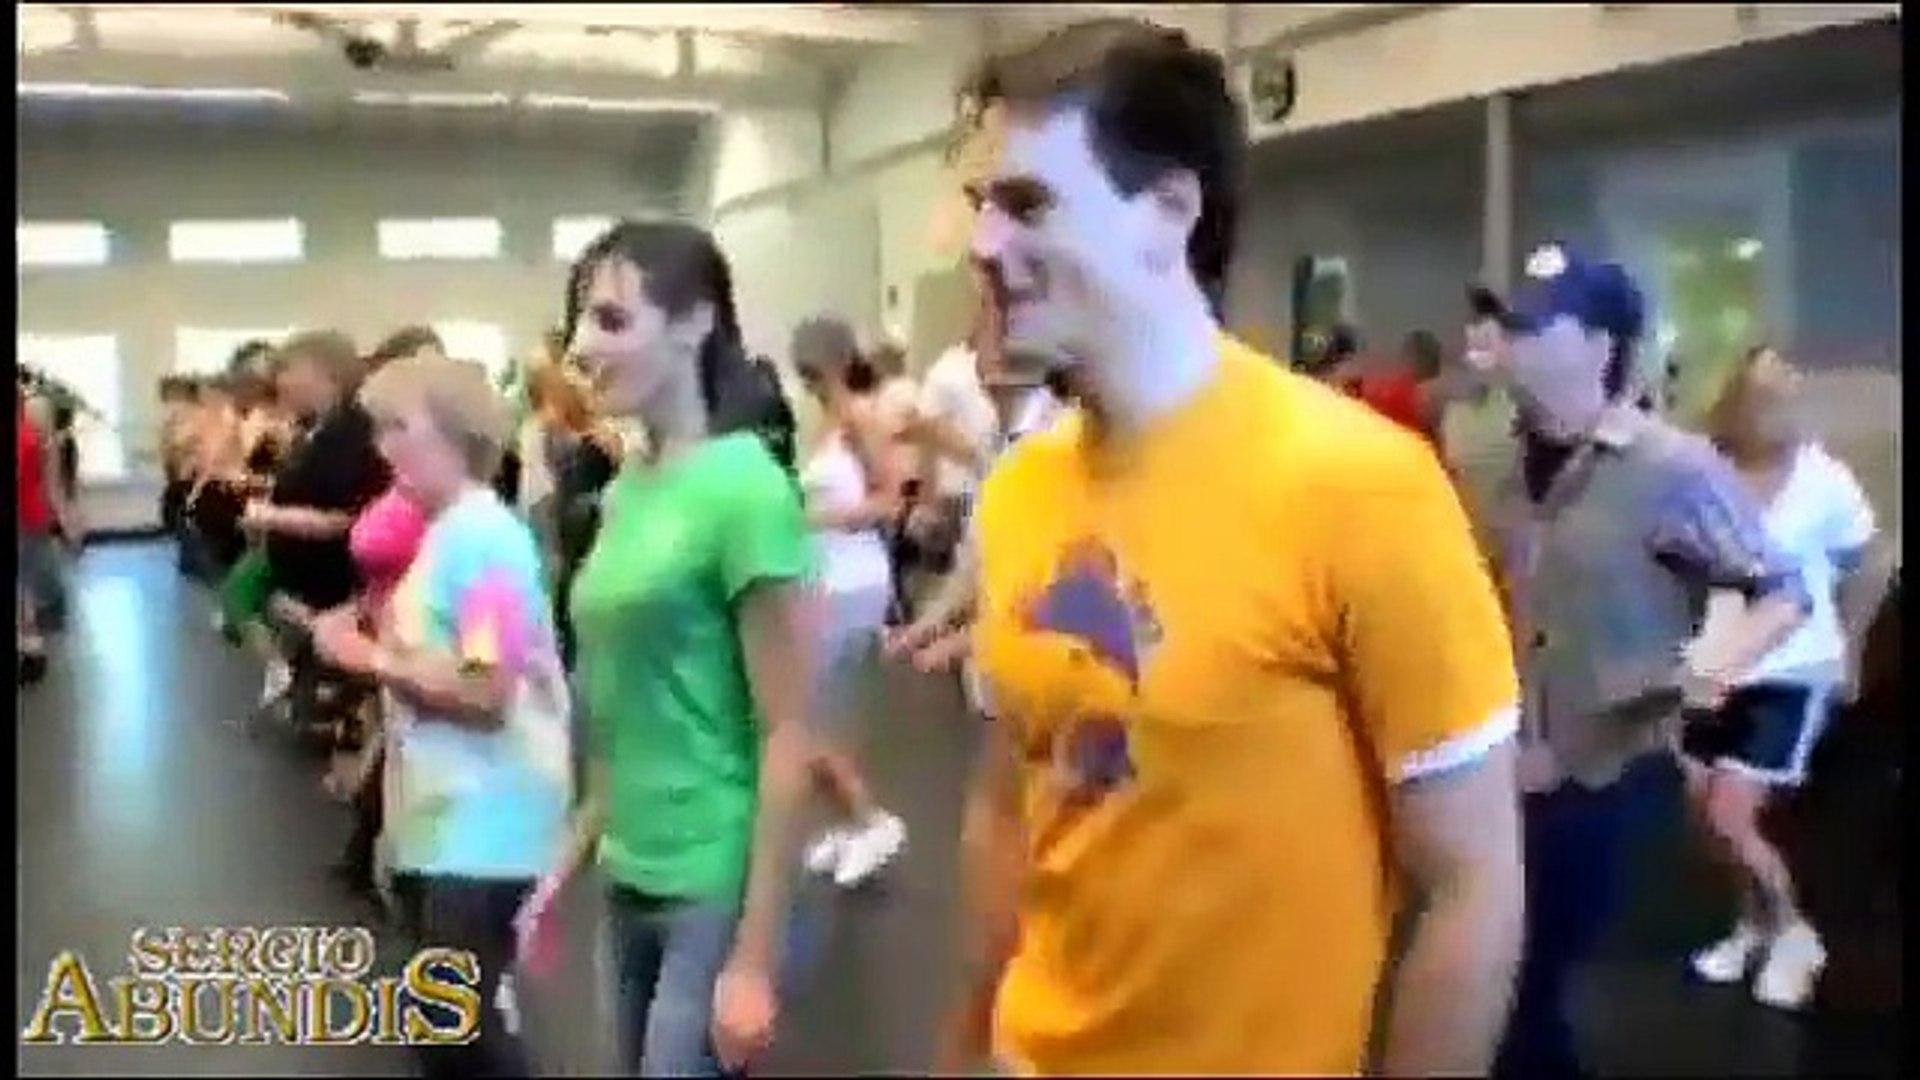 Vamos A Bailar (Musica Country) - Sergio Abundis